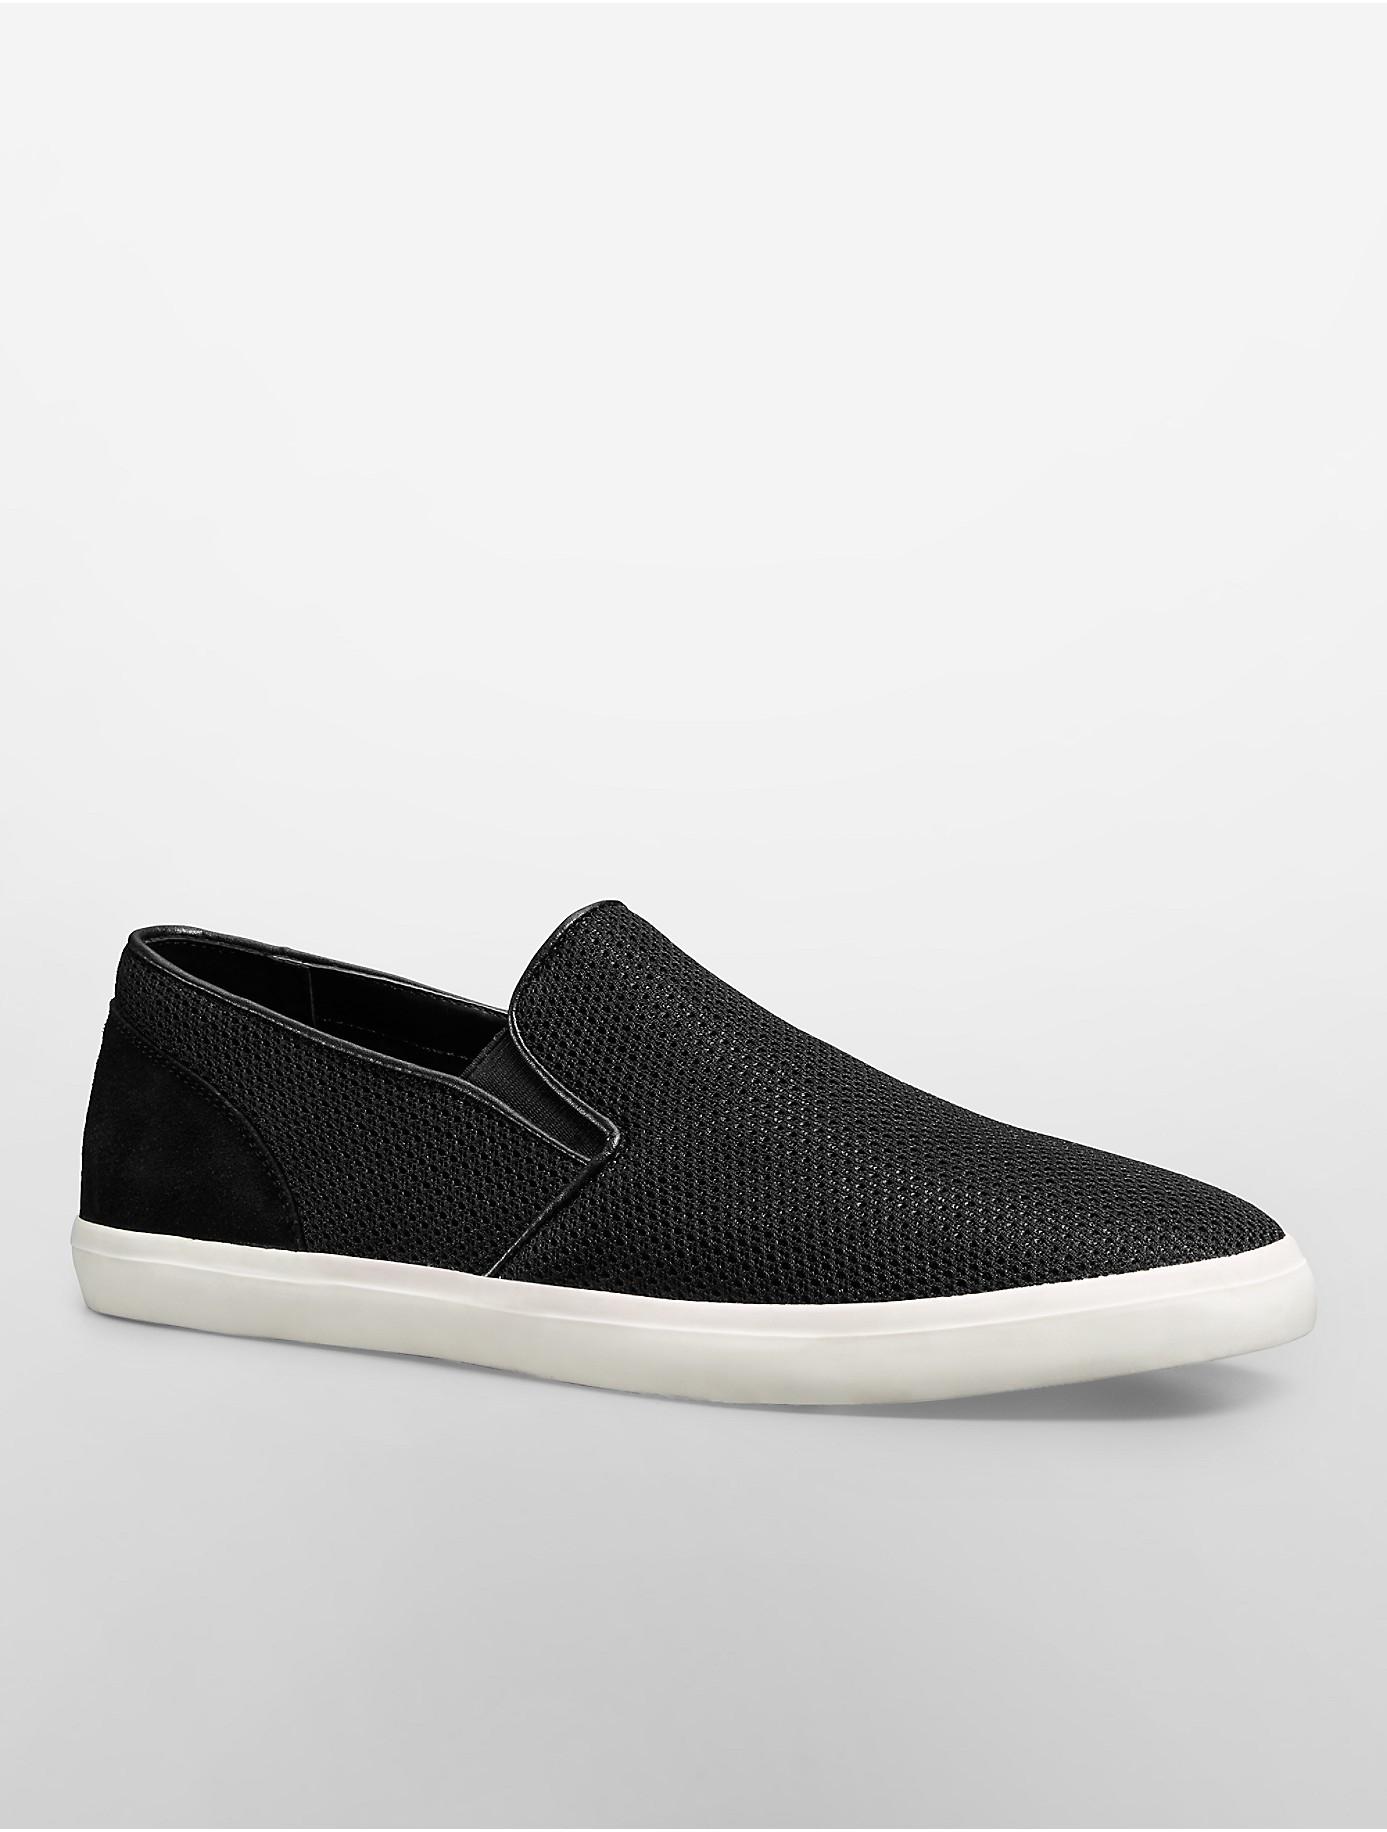 outlet store new arrival top quality Calvin Klein White Label Porter Mesh Slip-On in Black for Men - Lyst